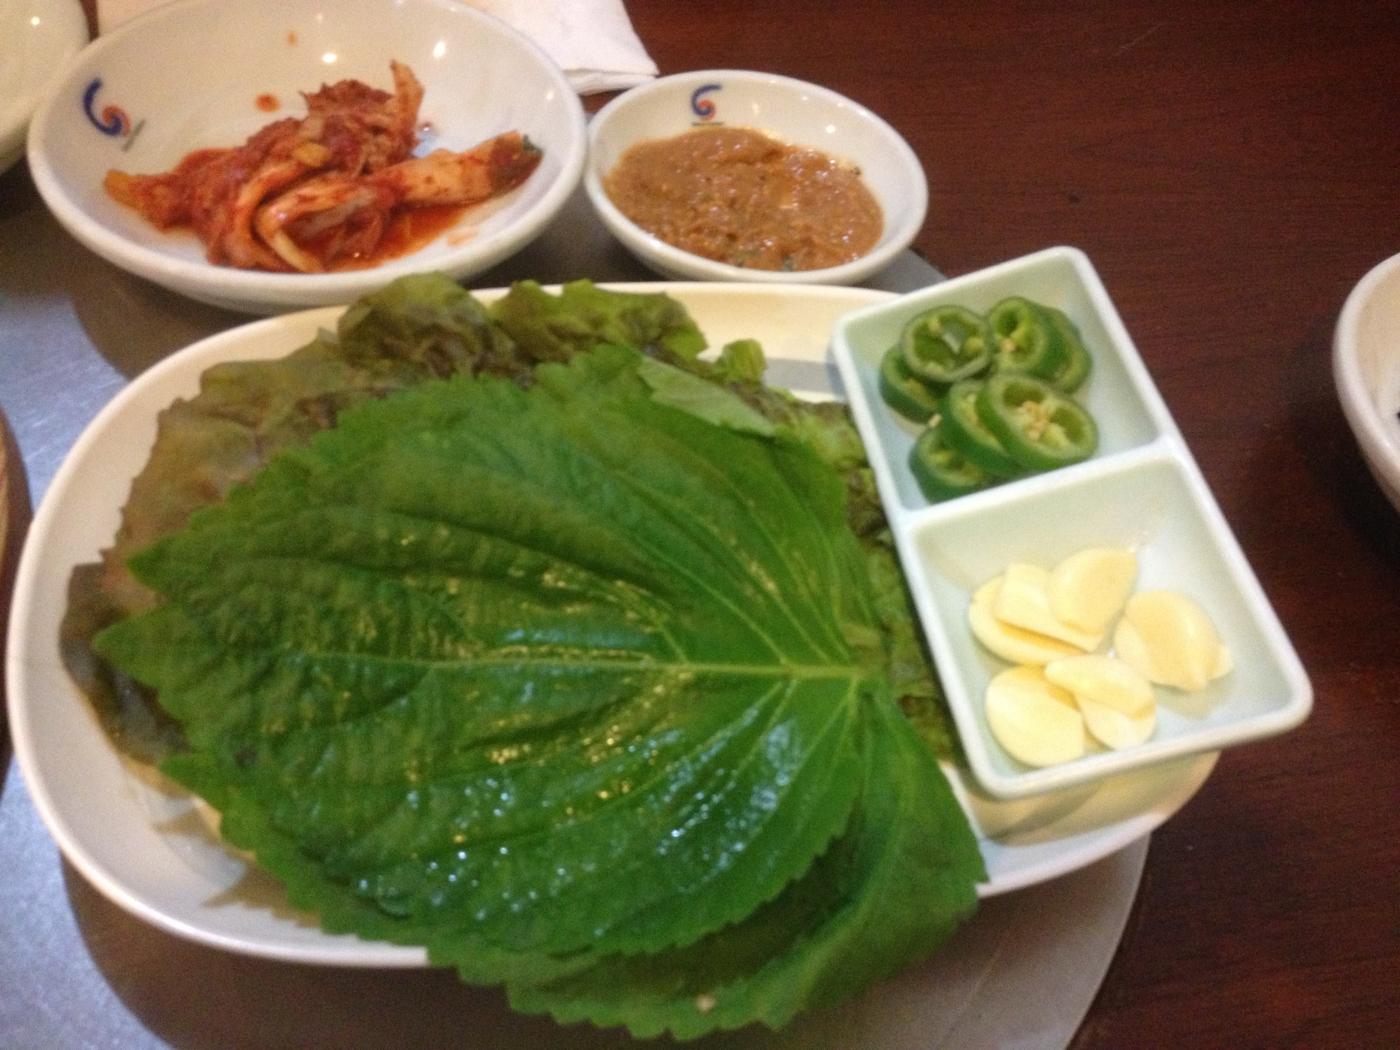 [jiejoy]星期日晚餐---首尔韩式餐_图1-5